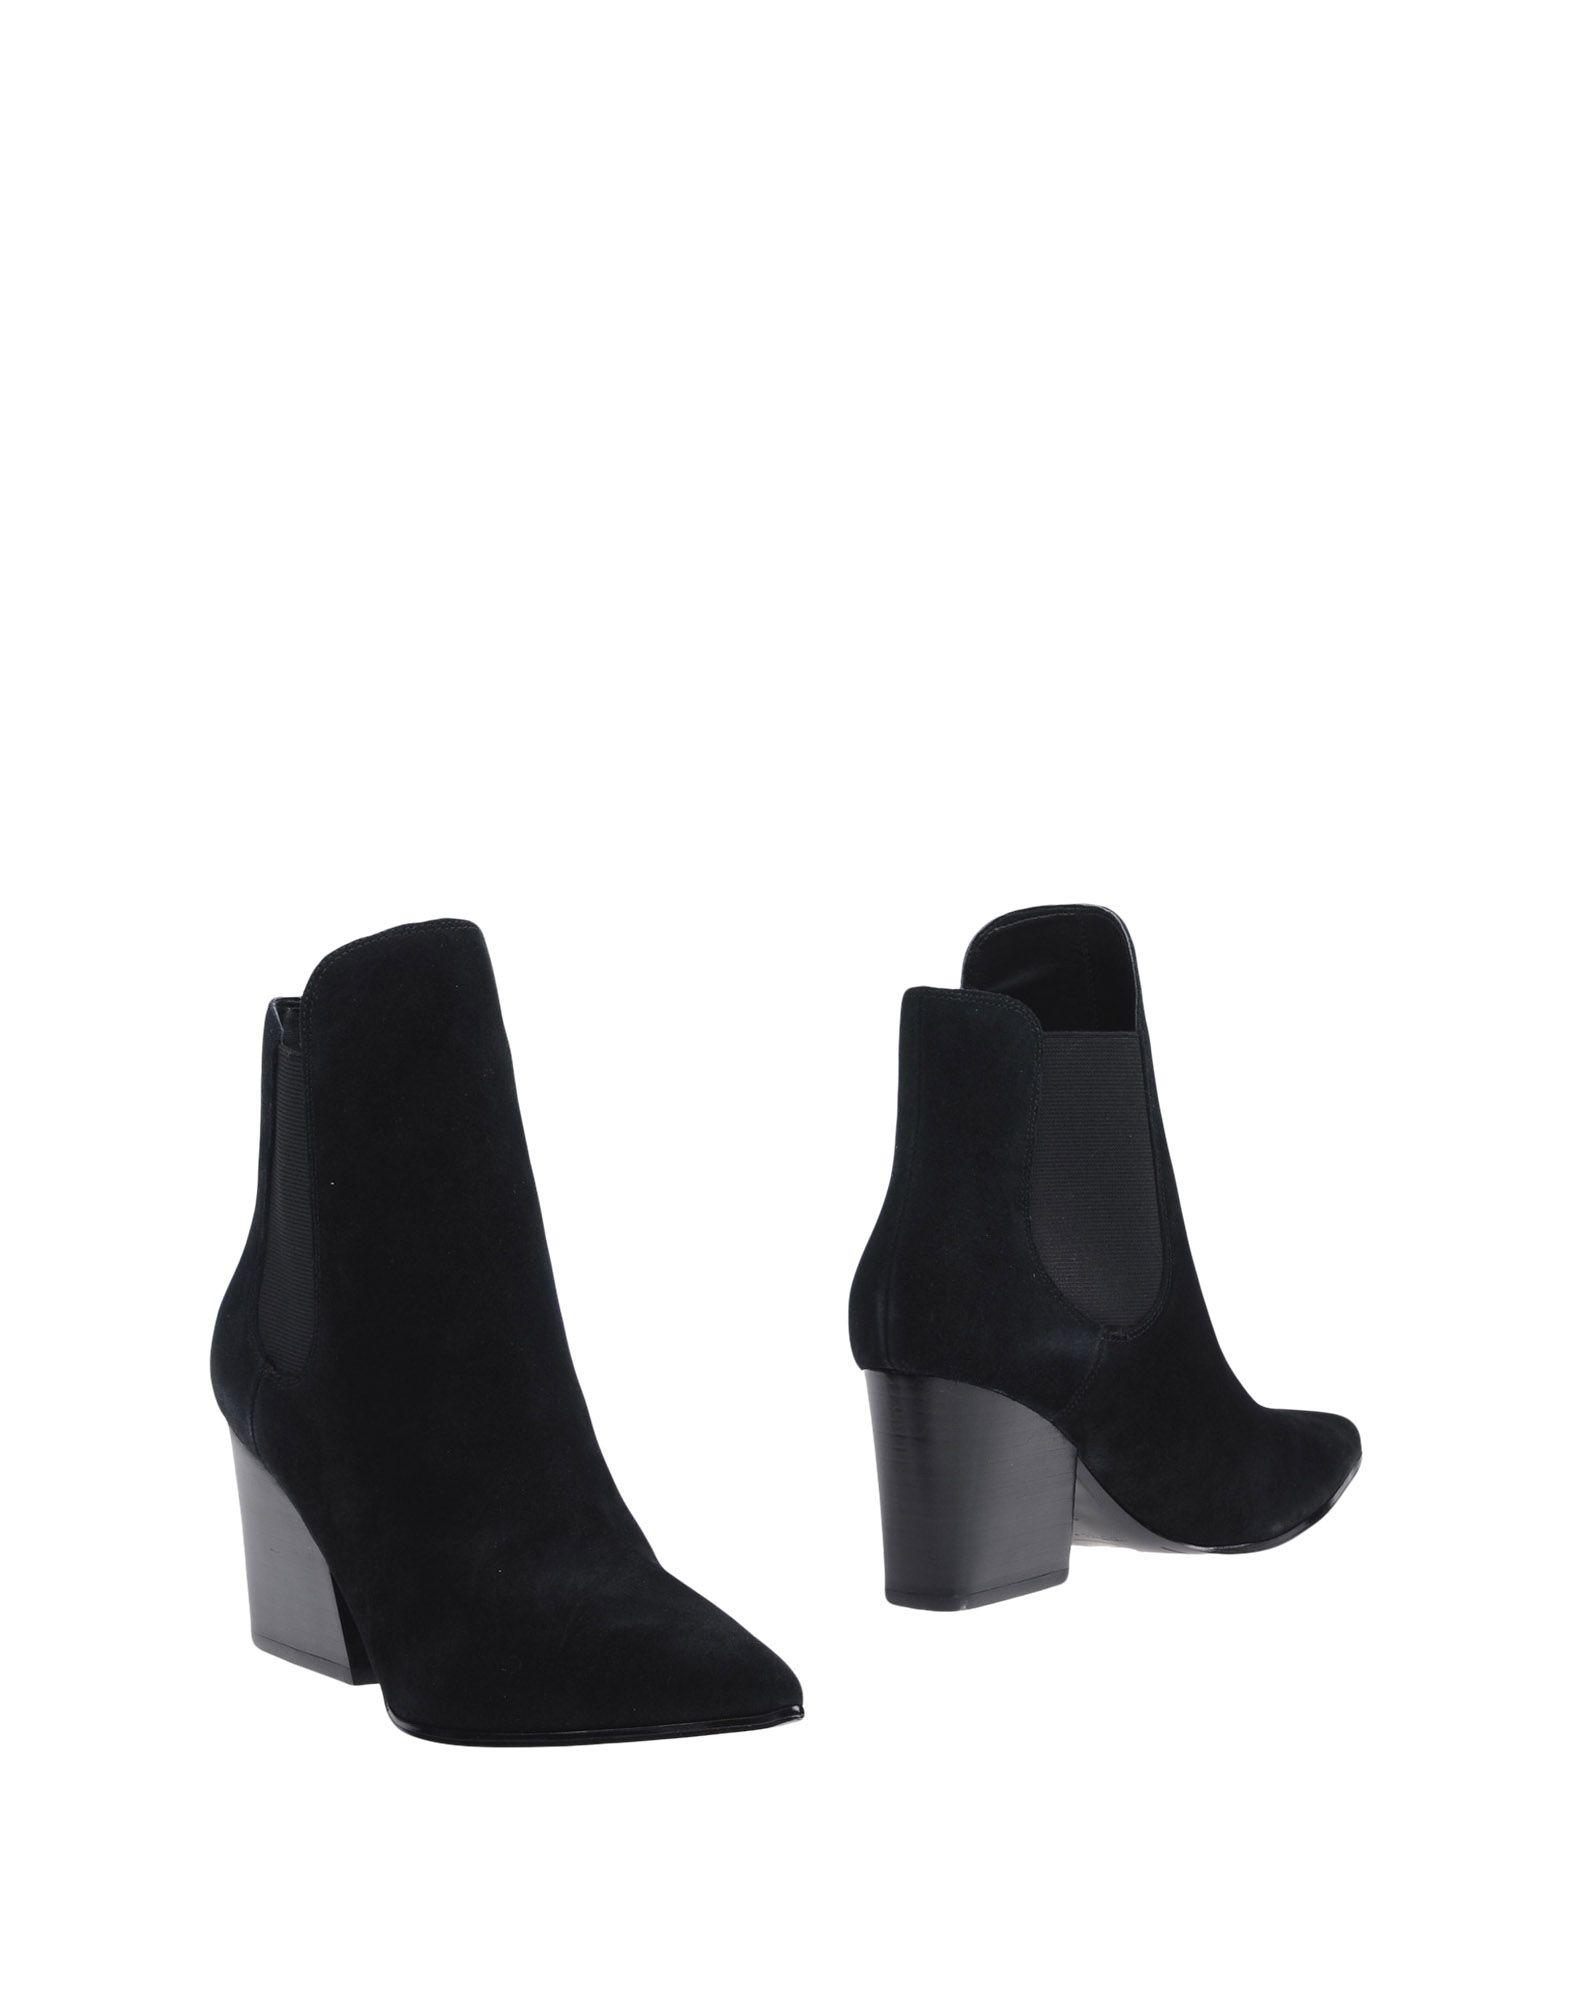 Kendall + Kylie Stiefelette Damen  Schuhe 11219083GG Gute Qualität beliebte Schuhe  567c44